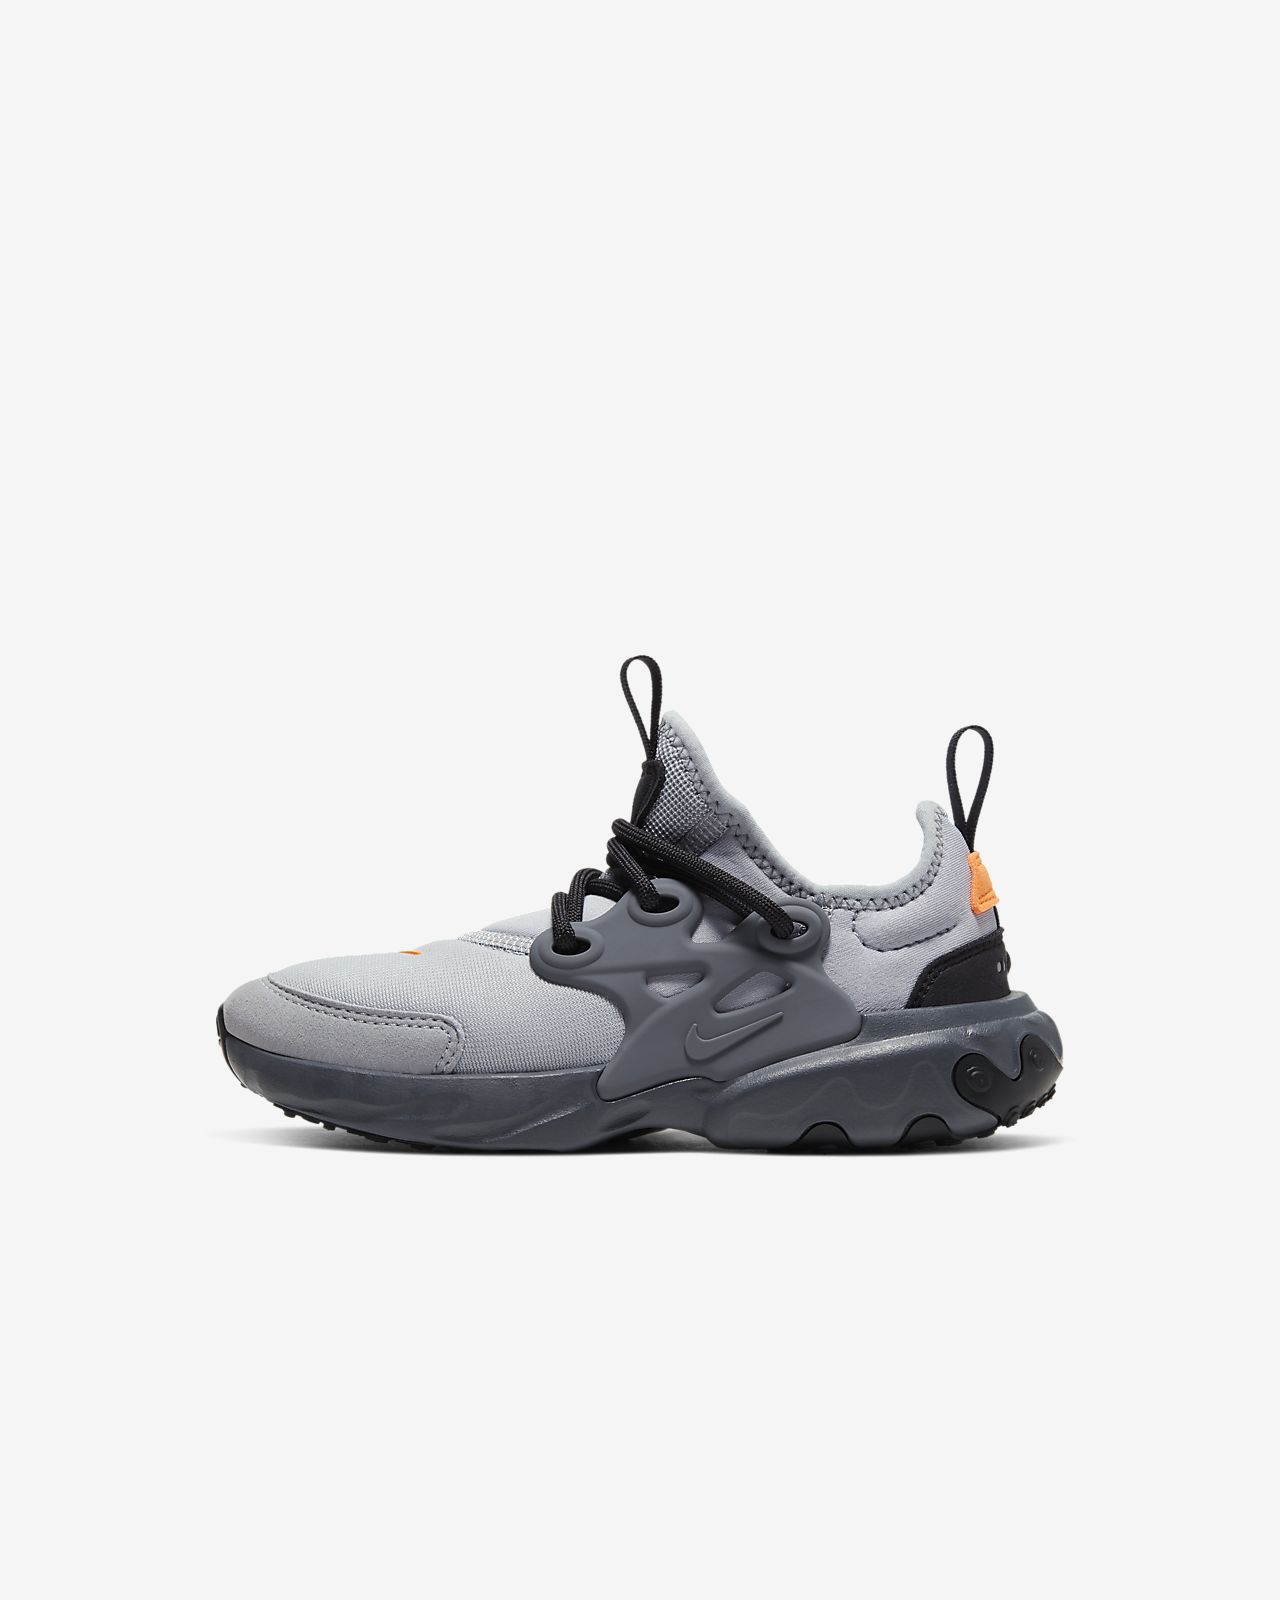 Air Max presto wasserdicht? (Mode, Schuhe, Nike)